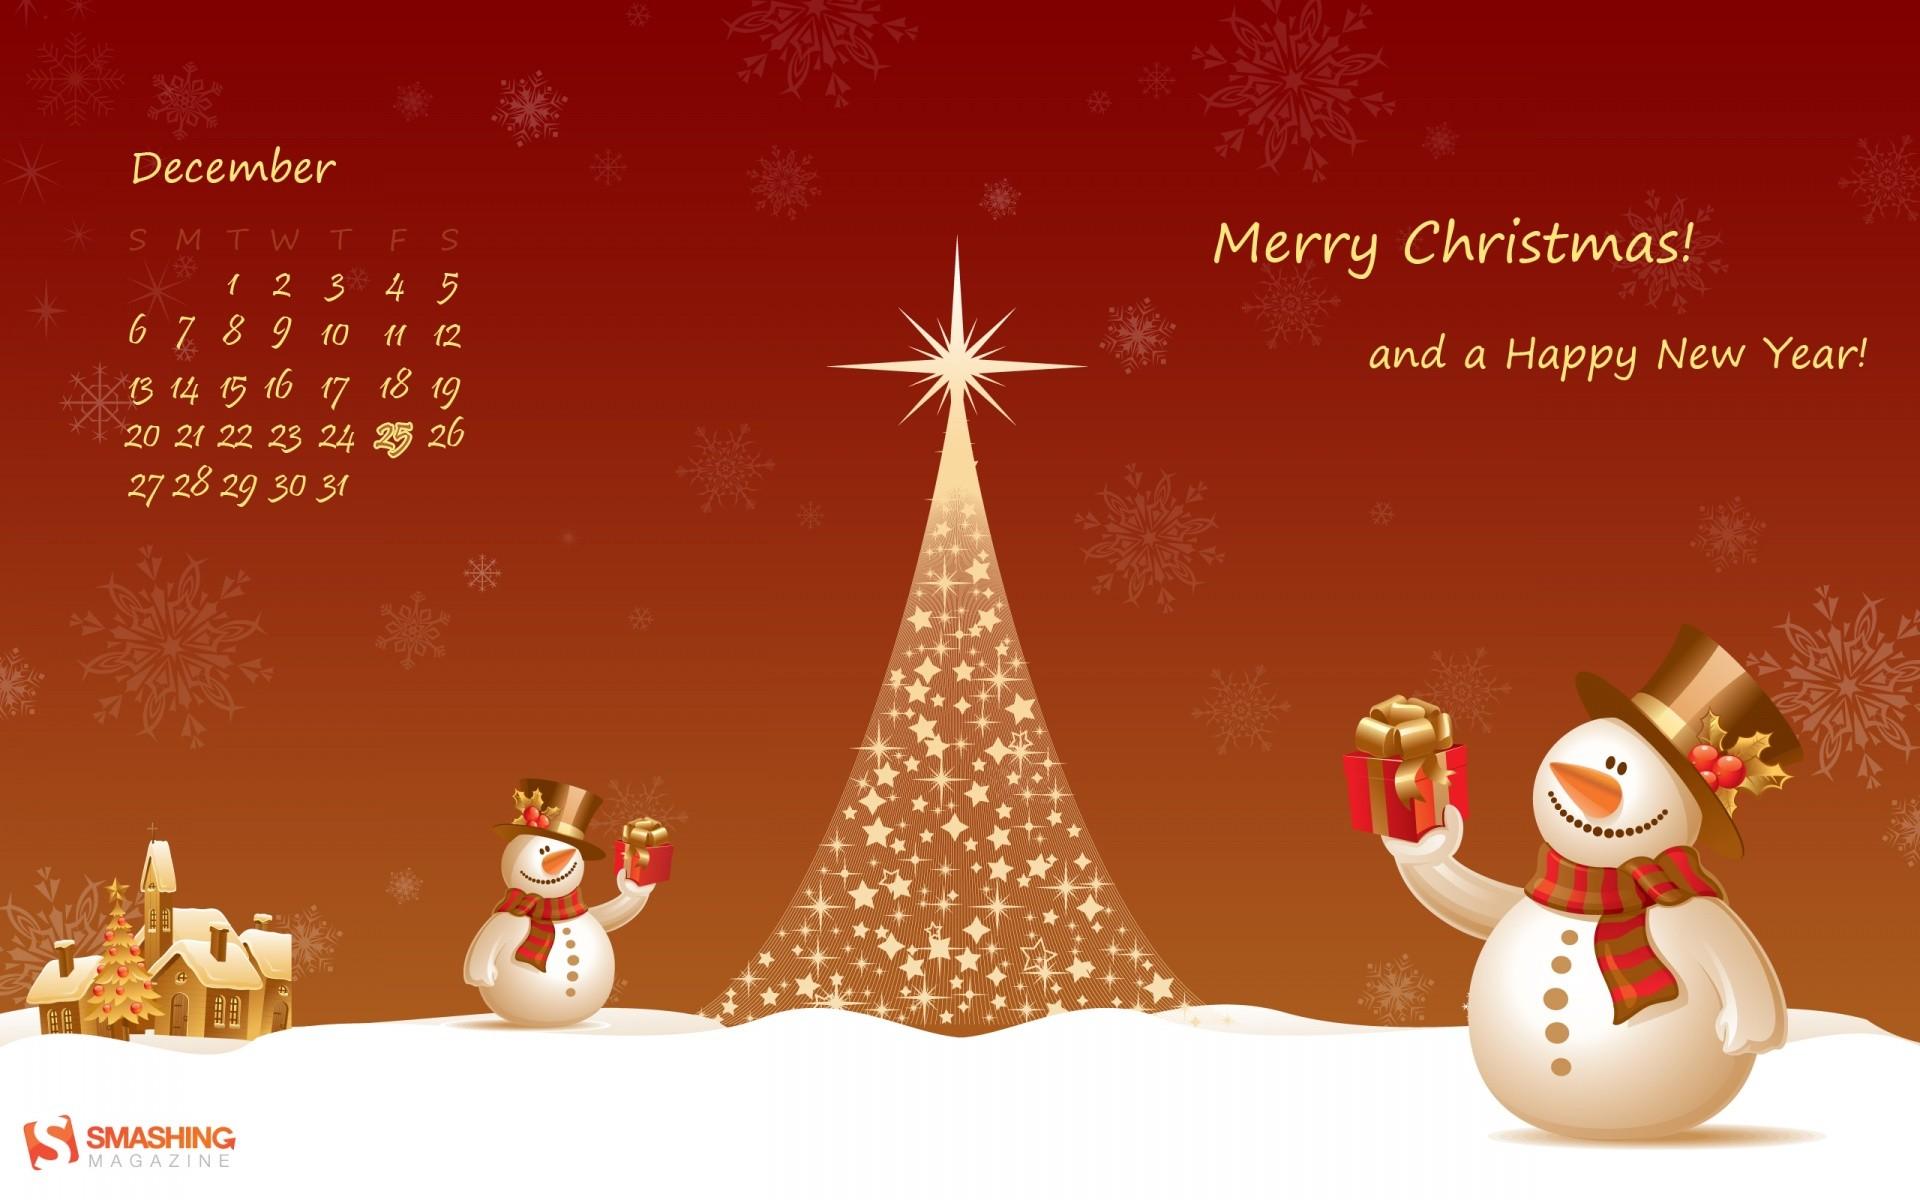 Desktop Christmas Wallpapers